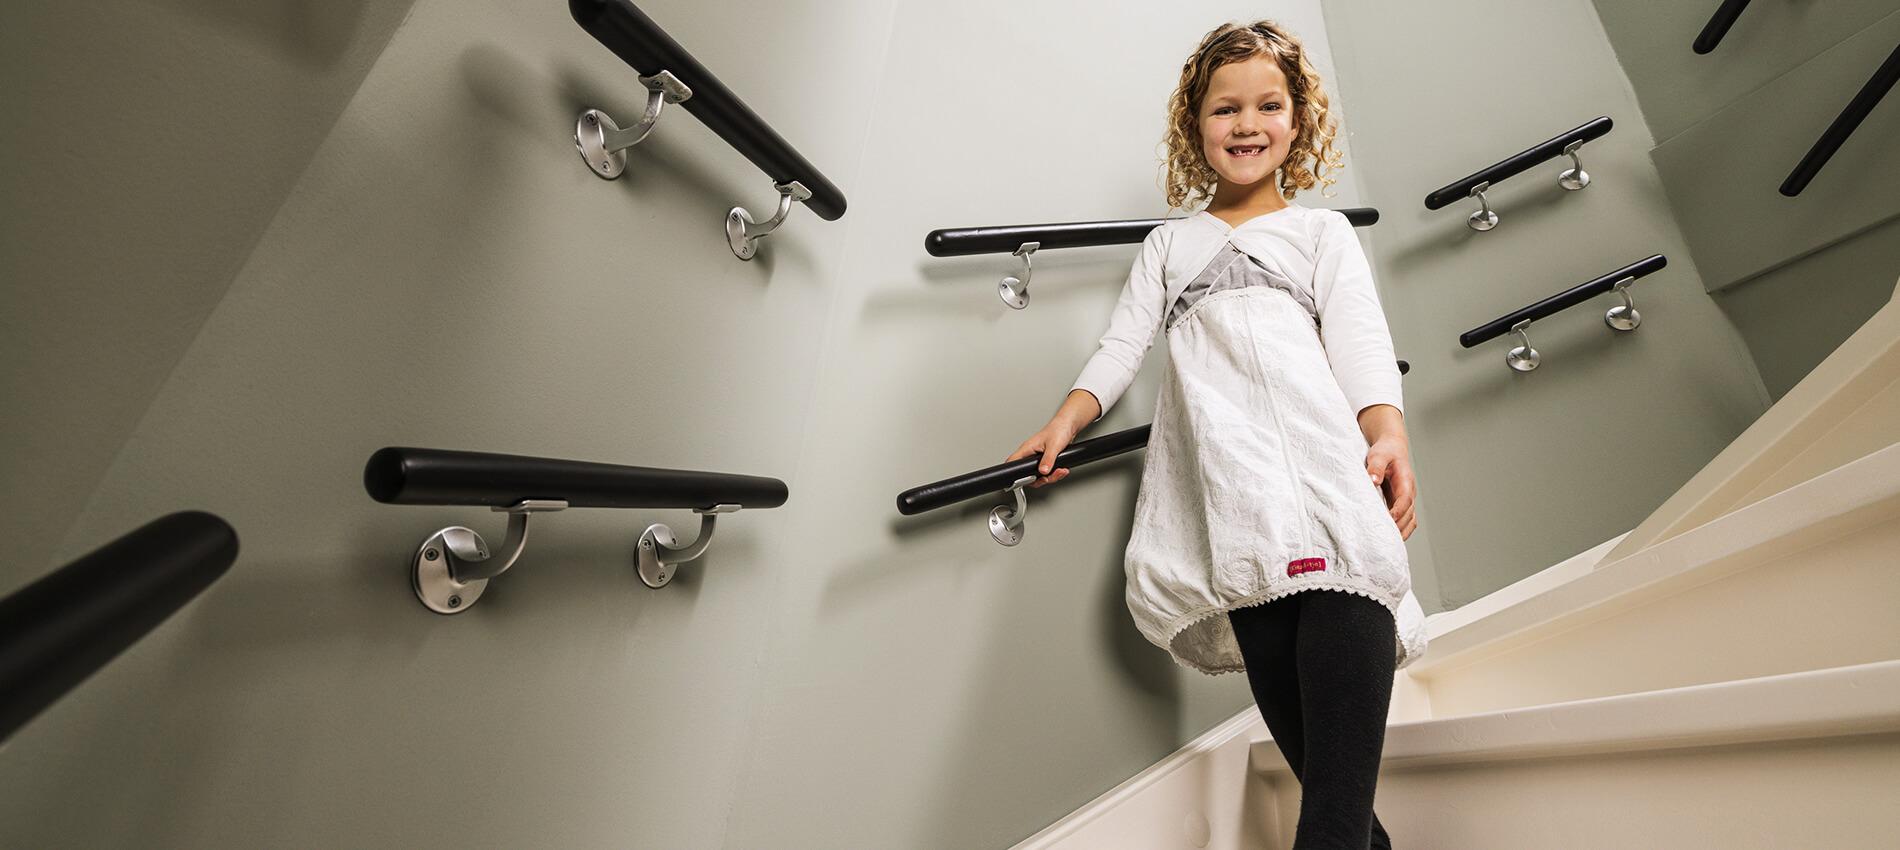 kindertrapleuning-veilig-duurzaam